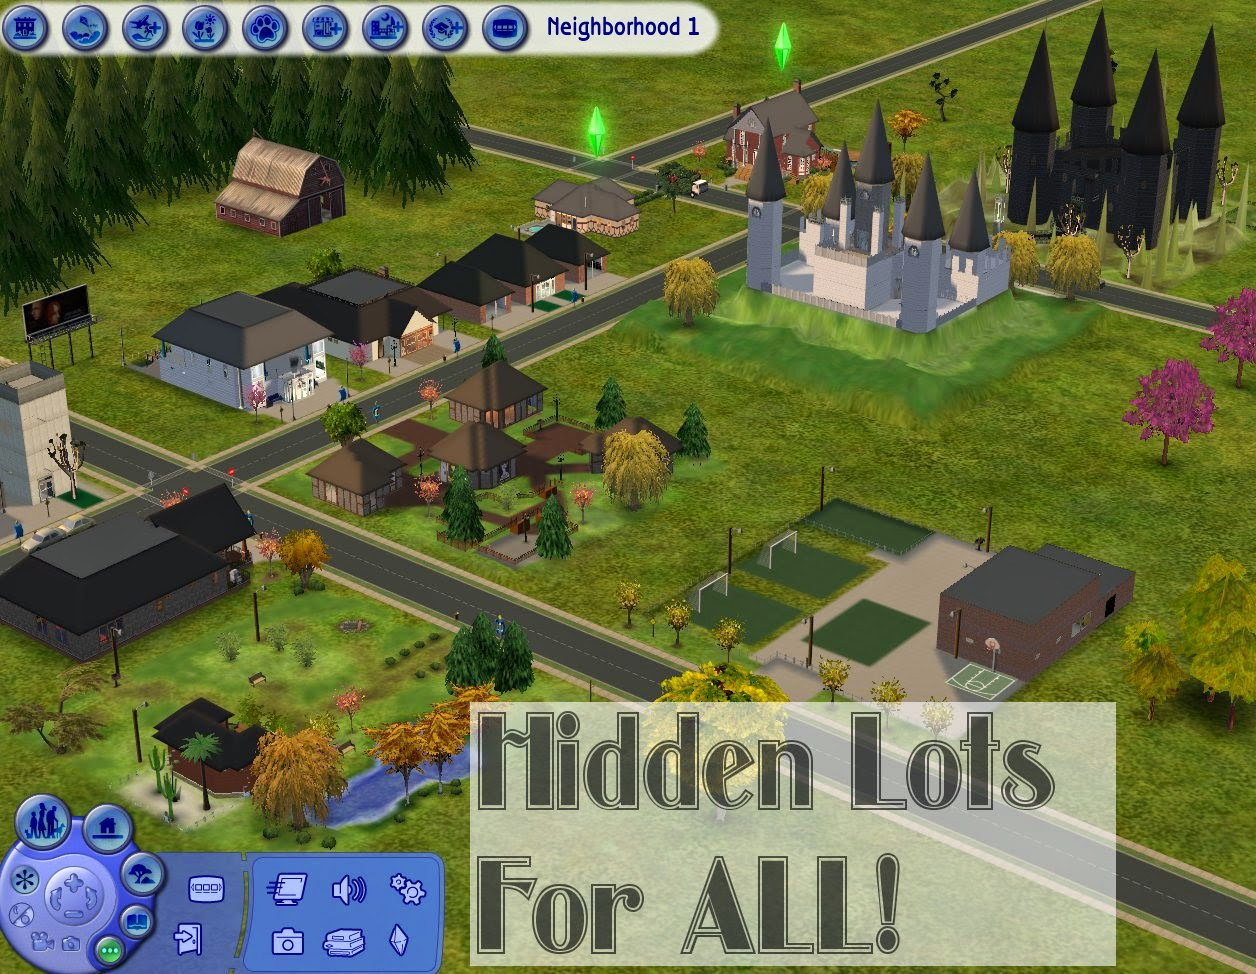 Sims 3 Hidden Springs Free Download Mac - fiterioark